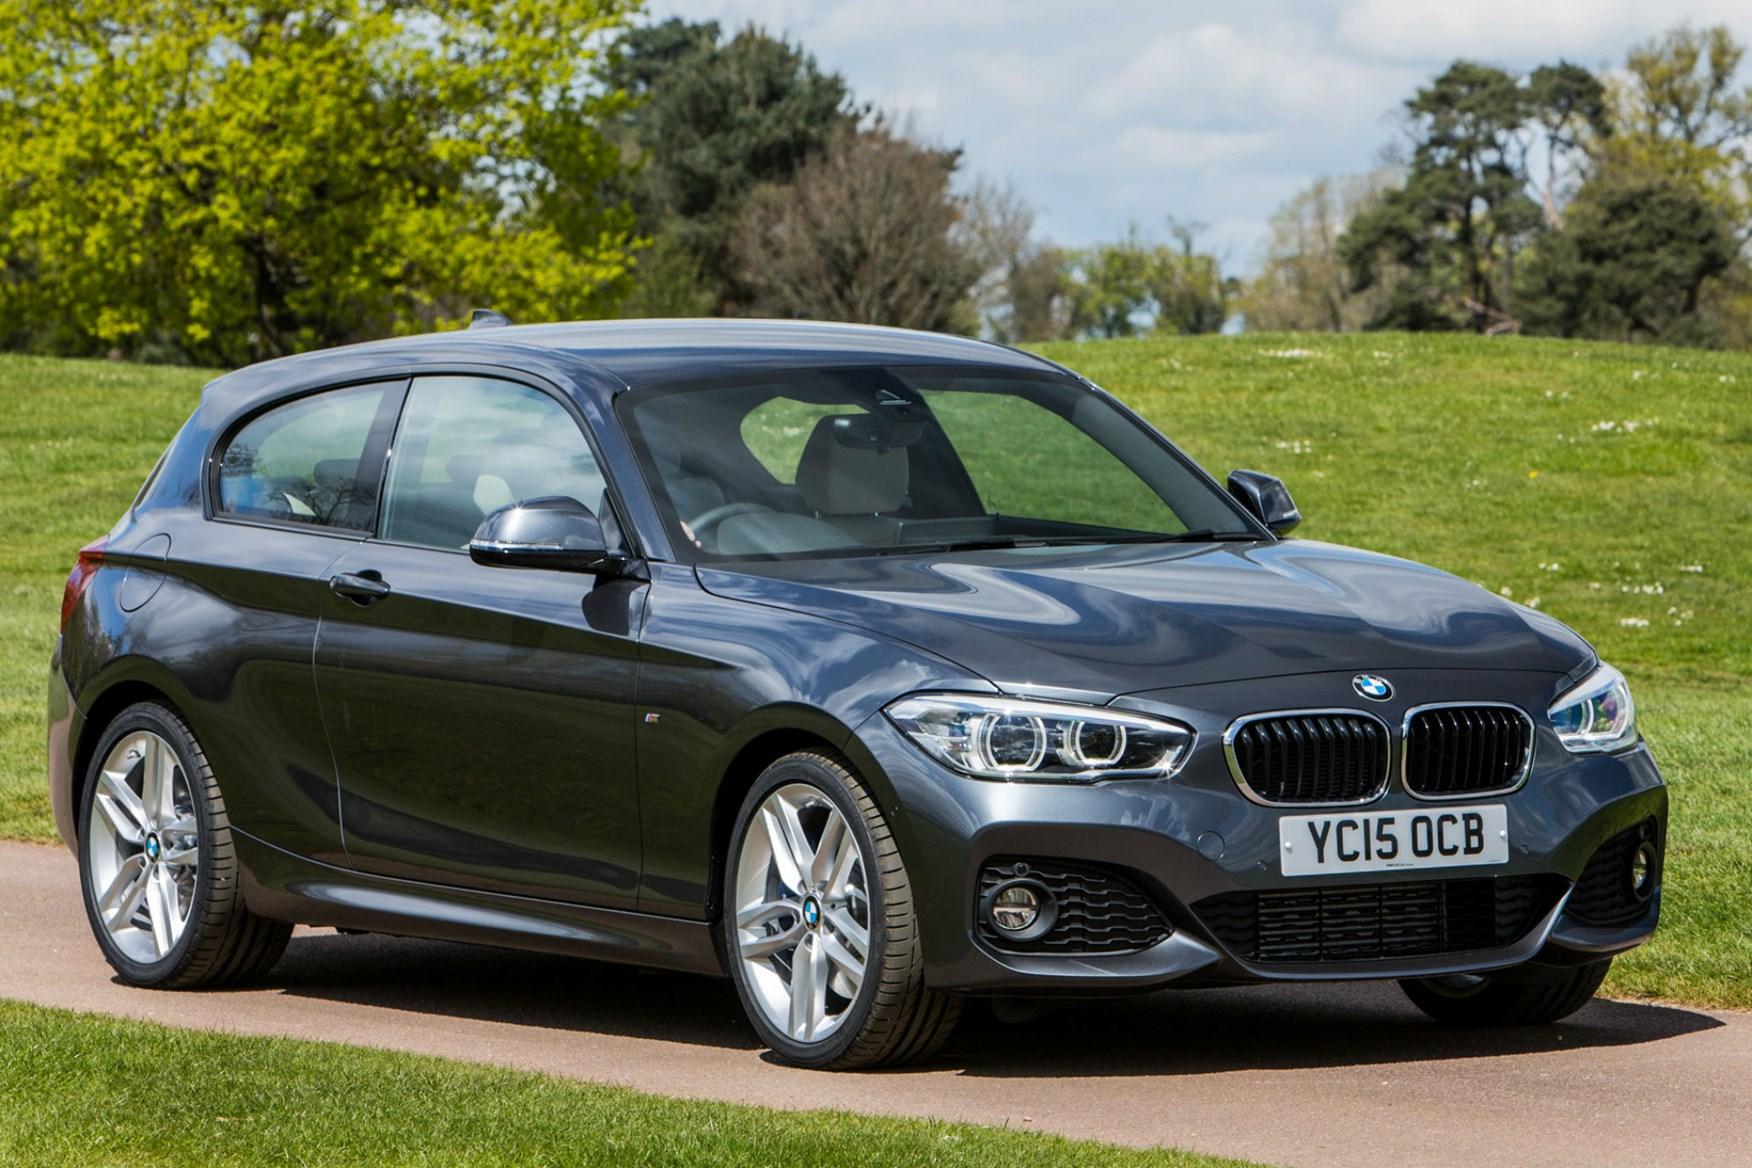 BMW 1 Series PCP finance offer